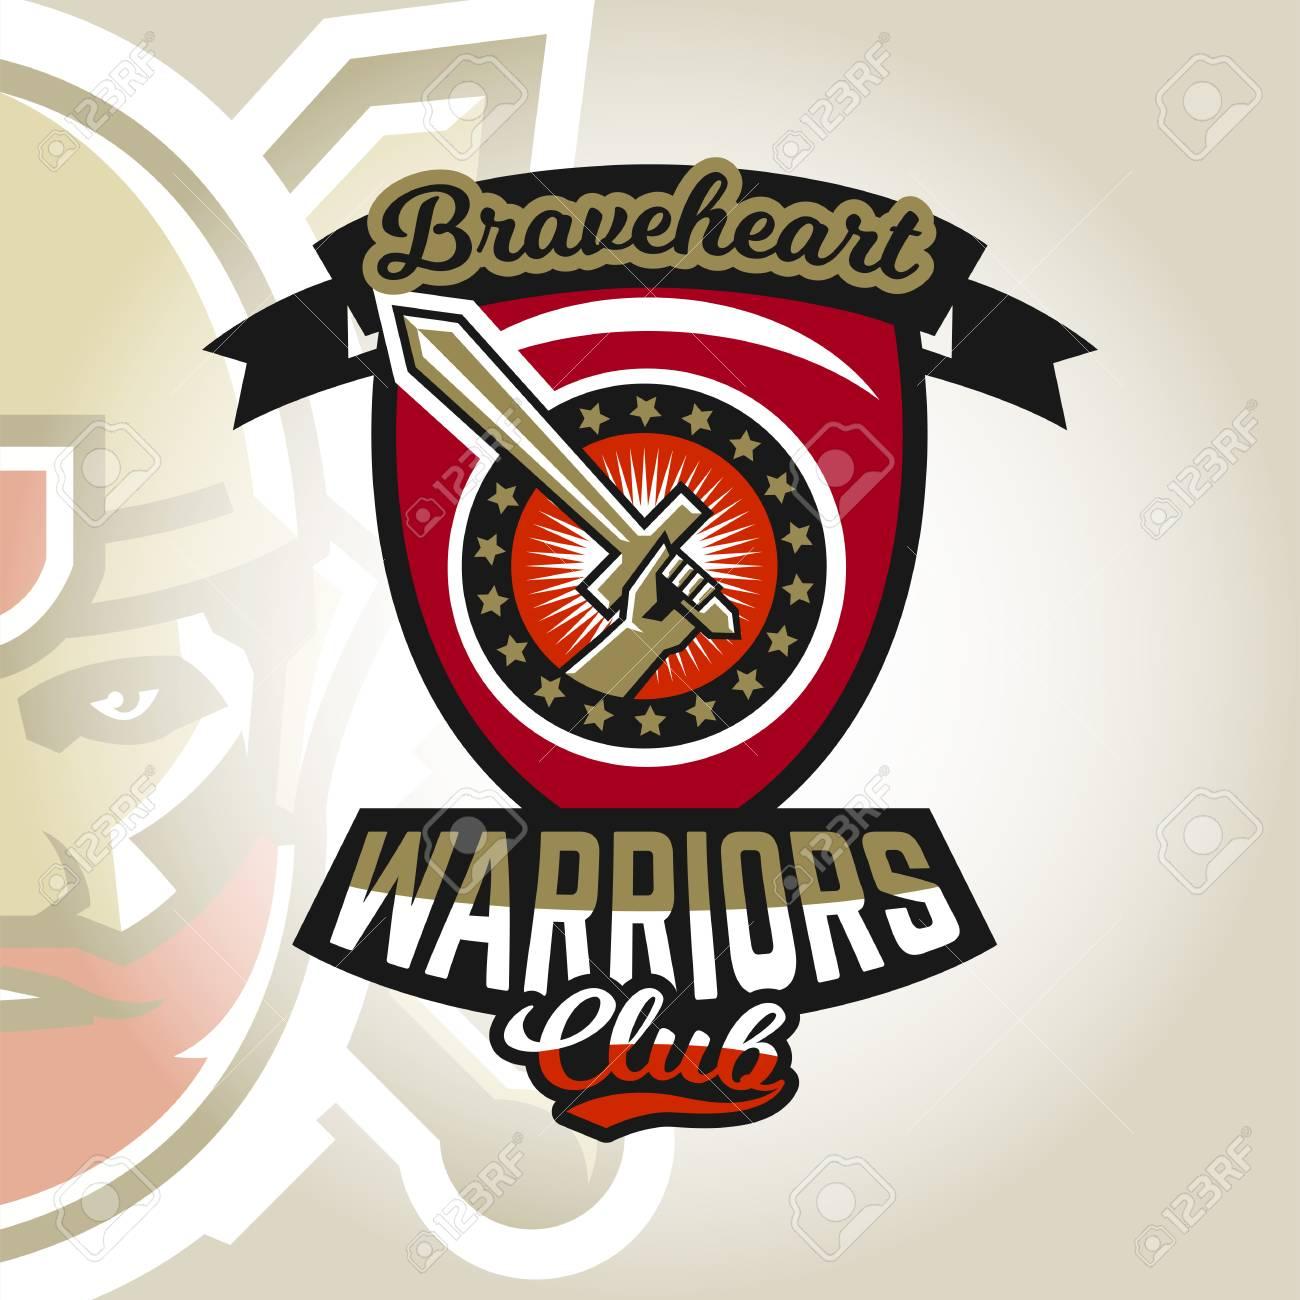 Colourful emblem, logo, sticker, hand holding a sword, warriors